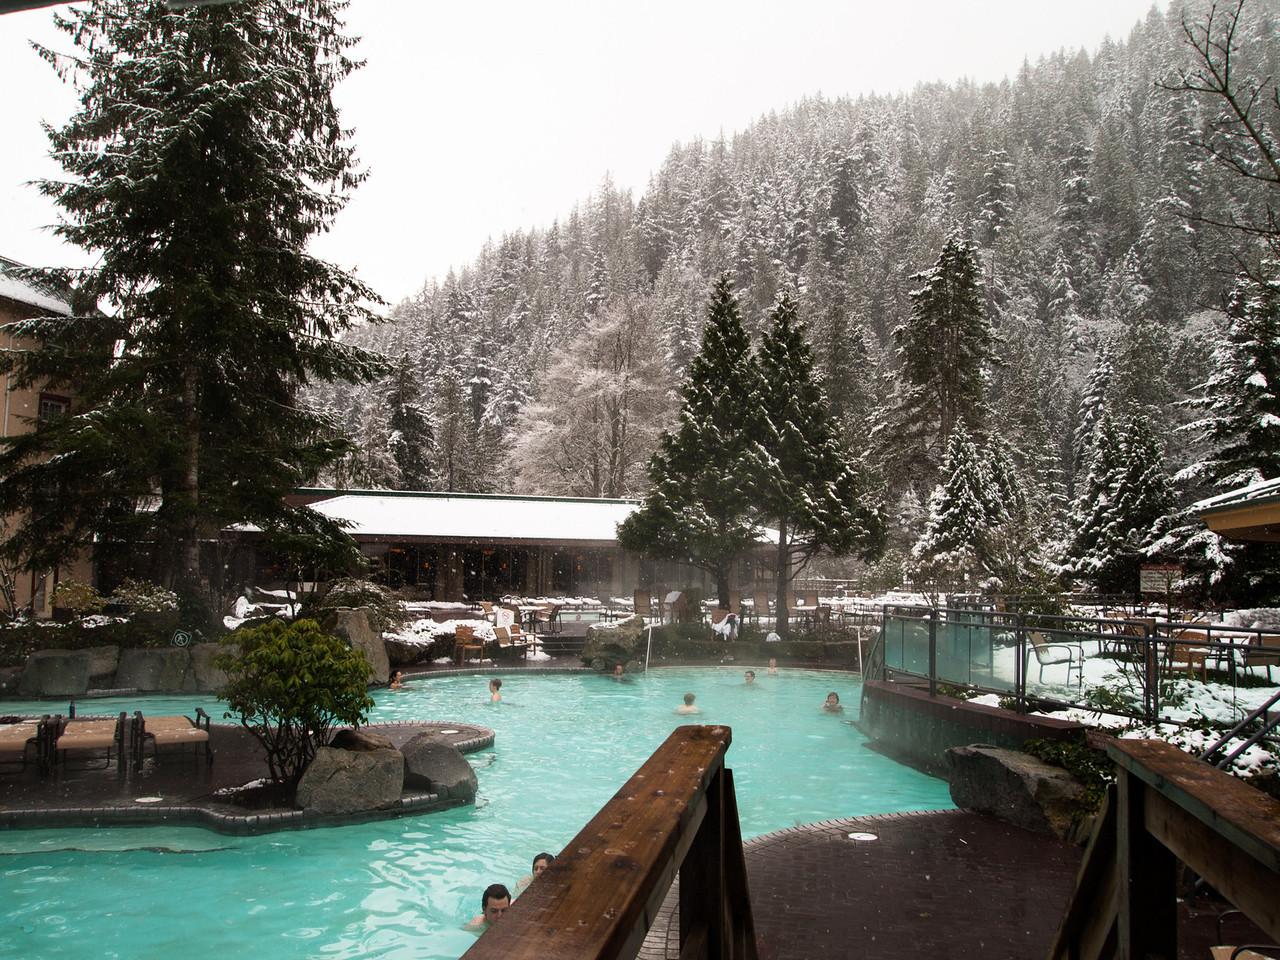 Harrison Hot Springs Resort - Family pool - temp around 85 F